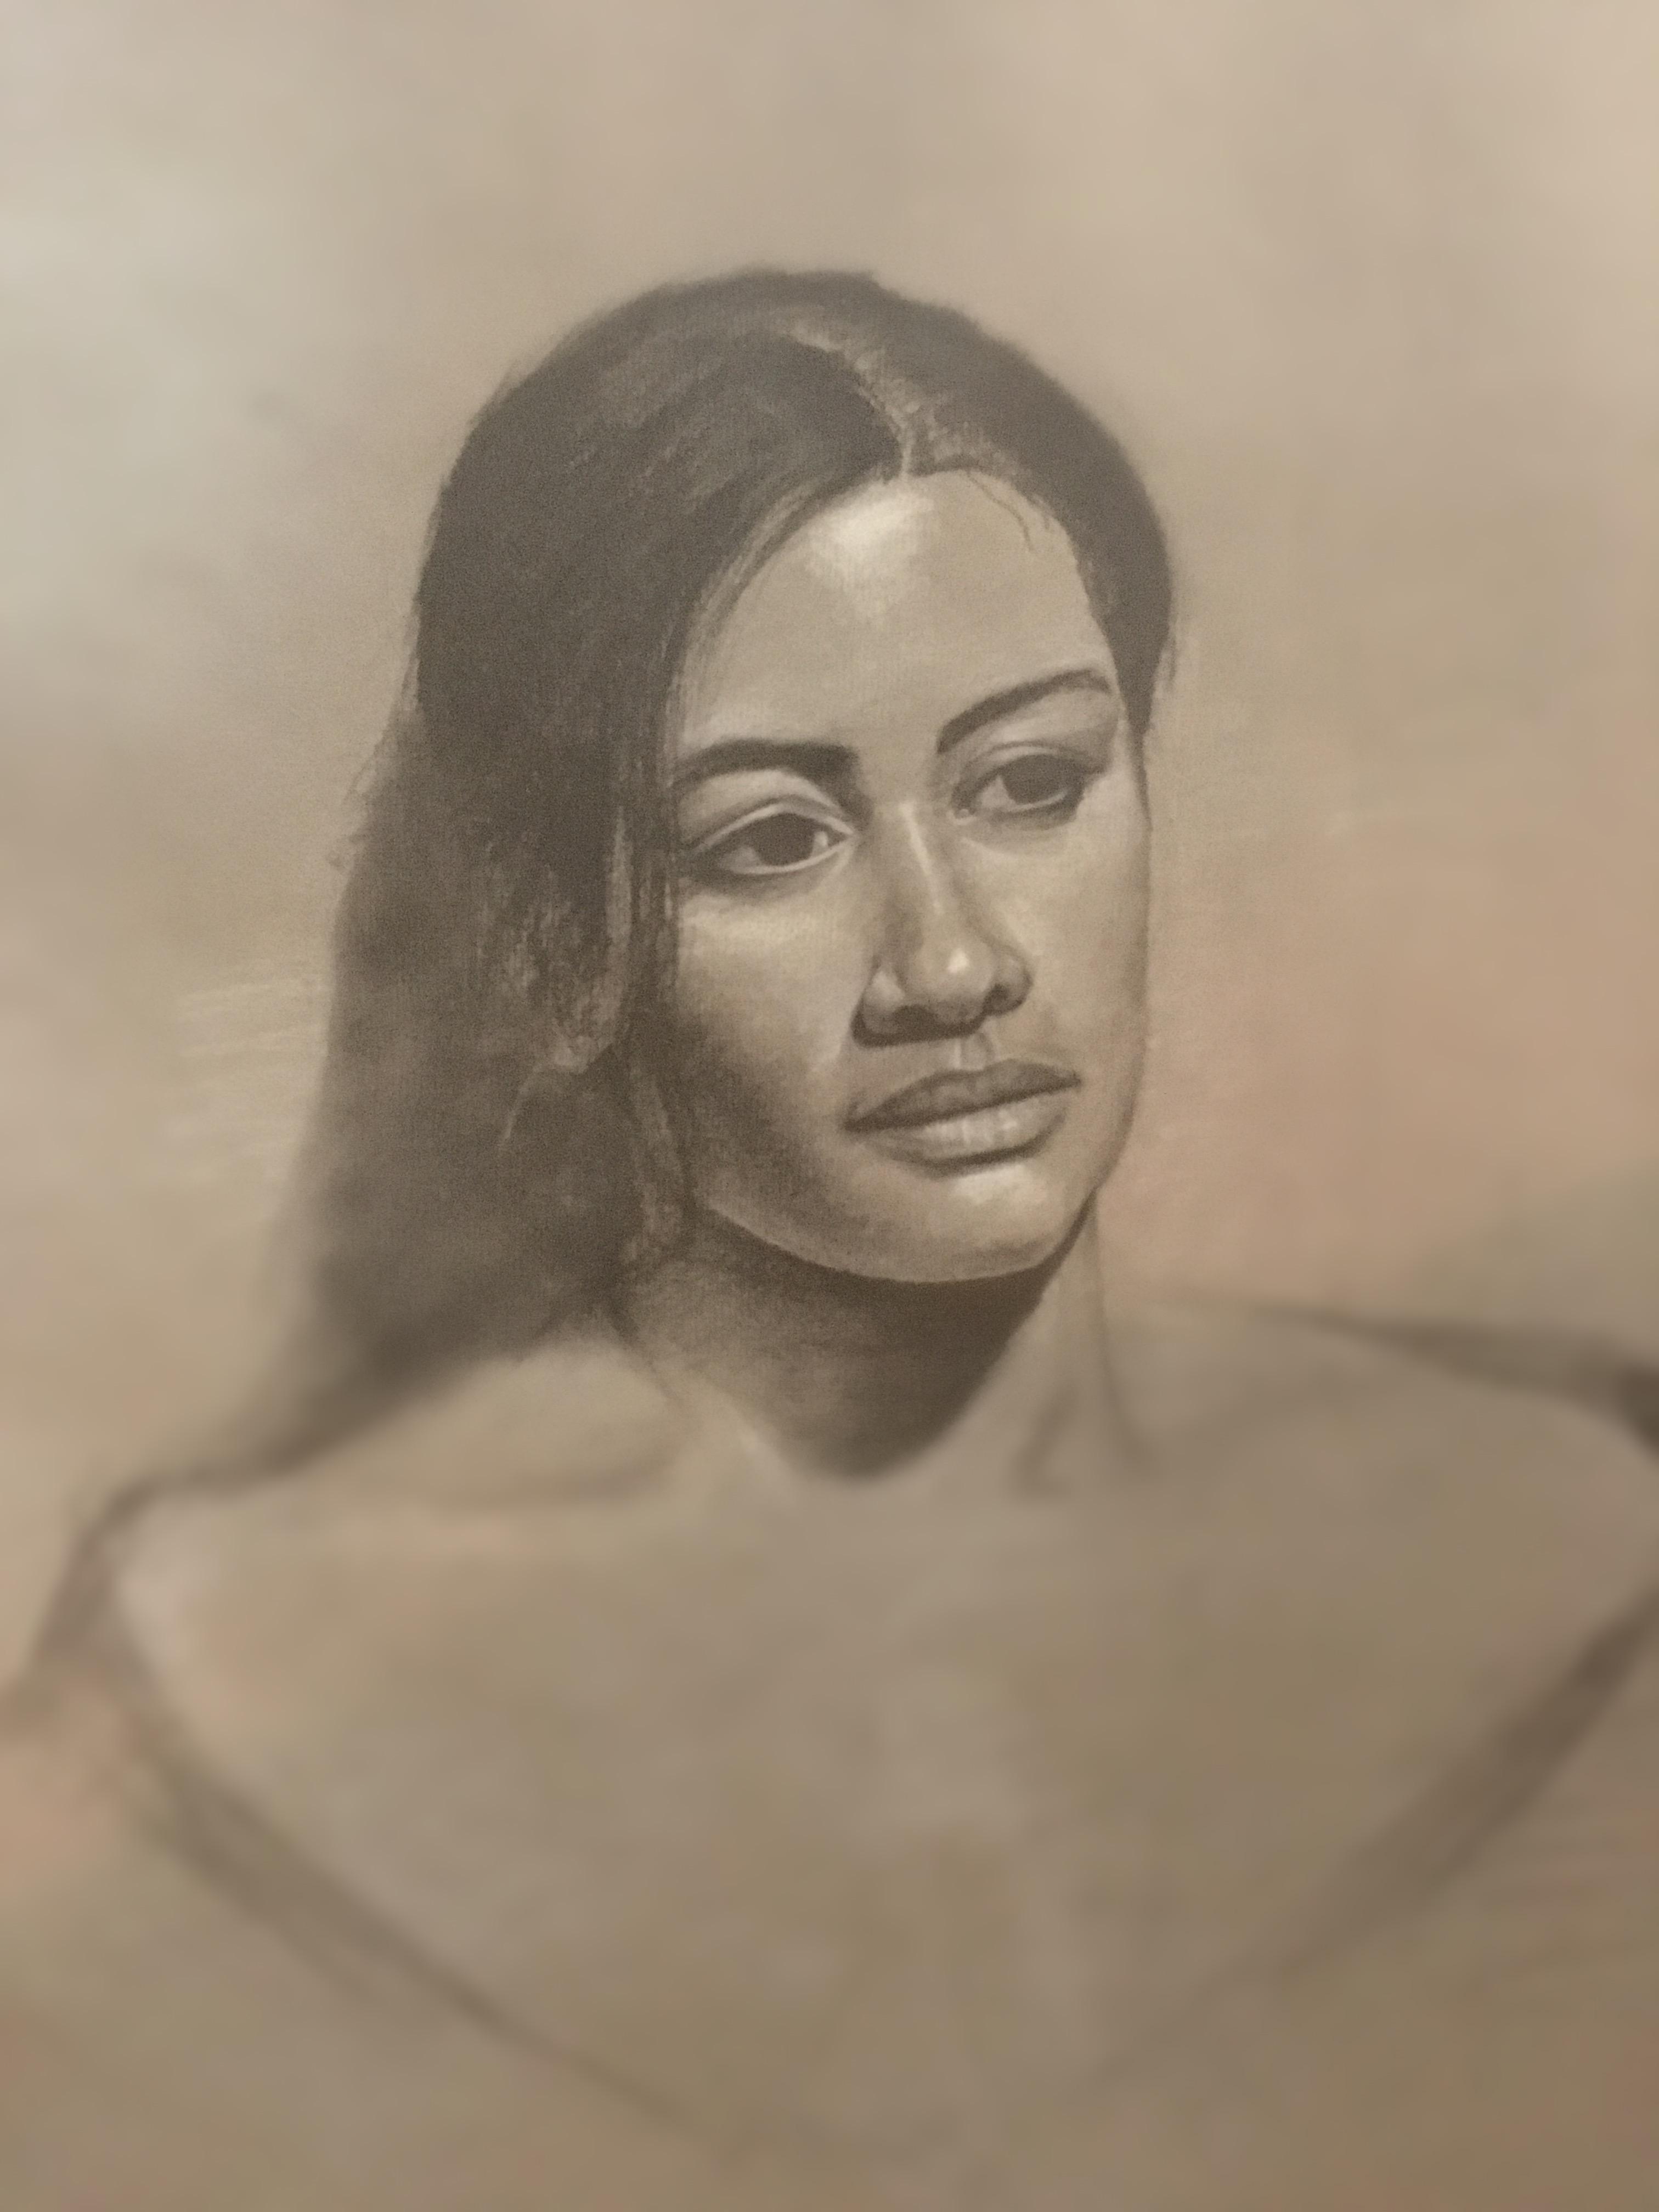 Live Model Drawing IV